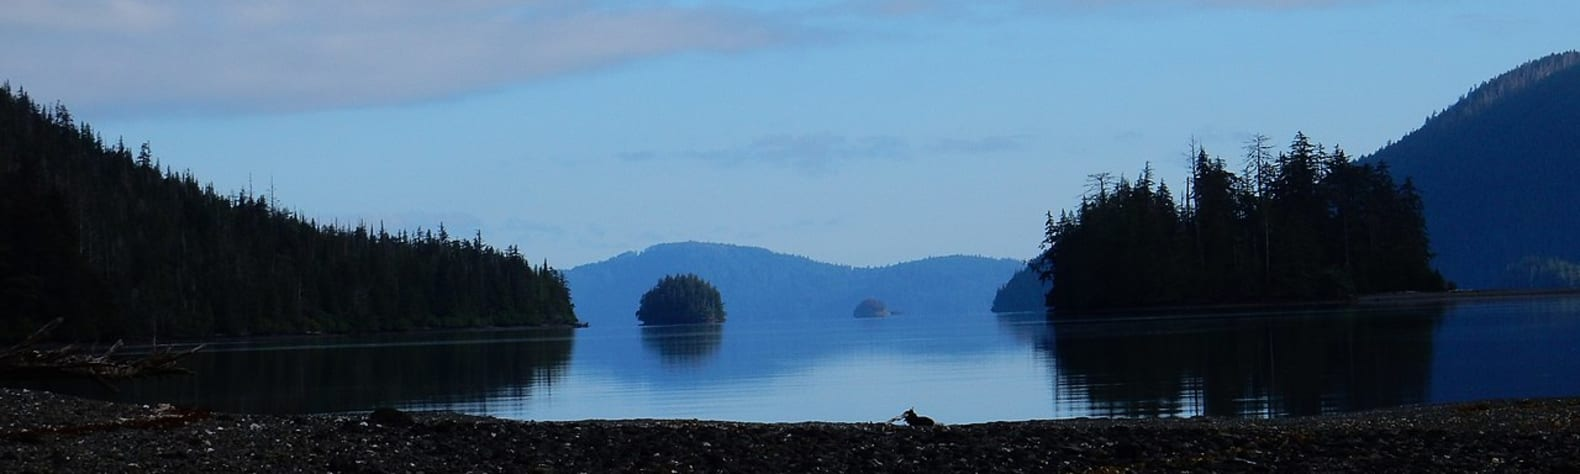 Gwaii Haanas National Marine Conservation Area Reserve and Haida Heritage Site